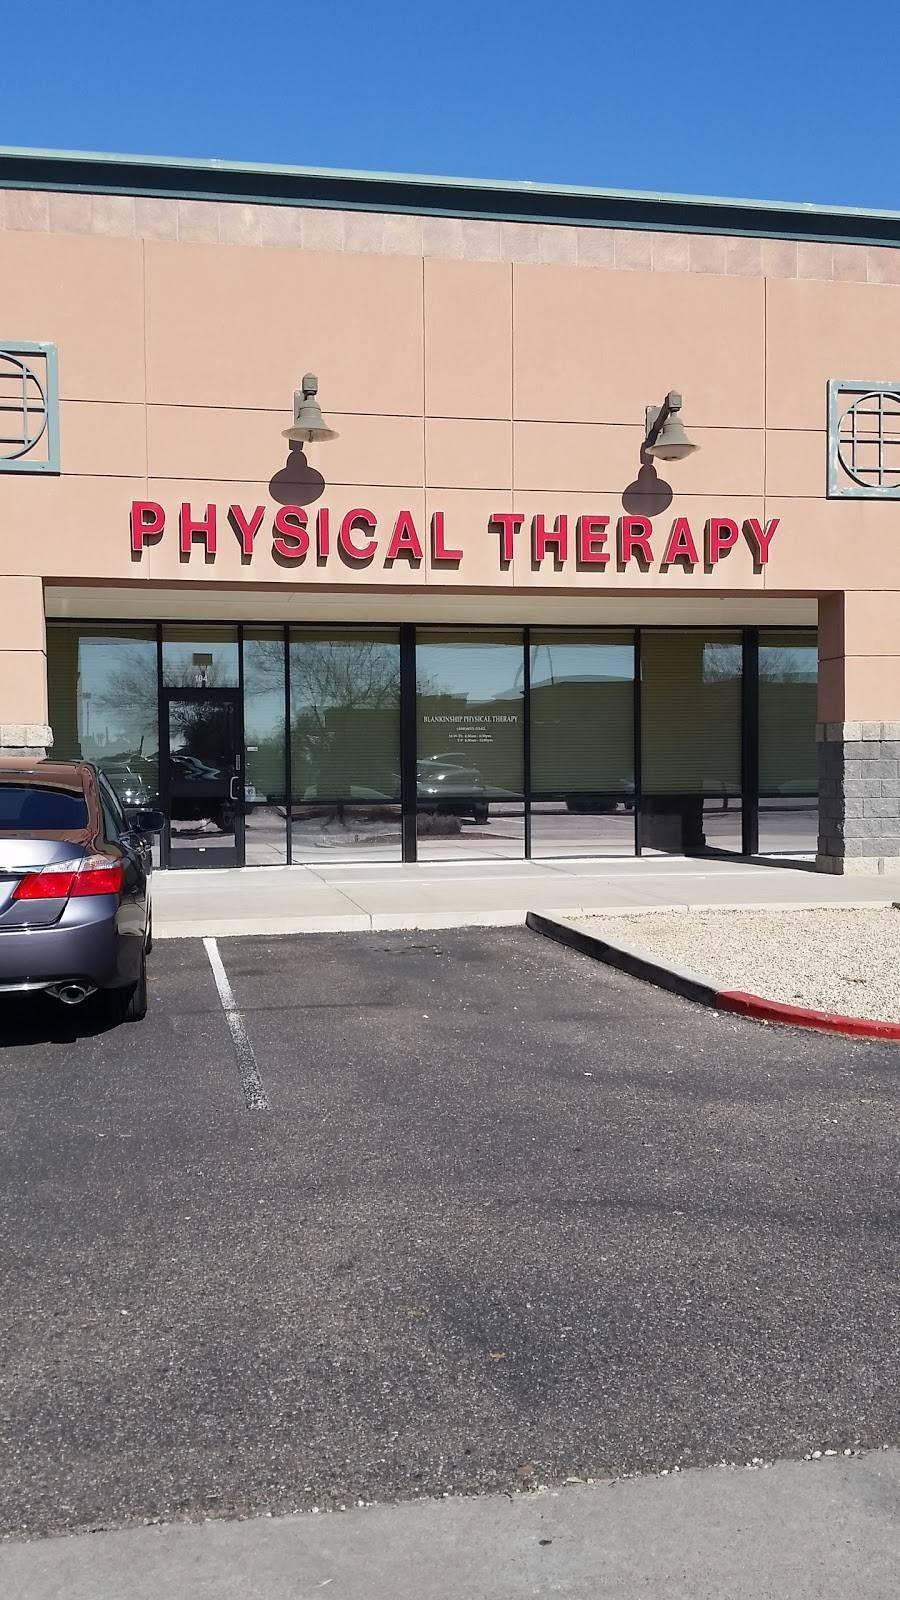 Blankinship Physical Therapy - physiotherapist  | Photo 2 of 9 | Address: 1534 E Ray Rd #104, Gilbert, AZ 85296, USA | Phone: (480) 855-5542